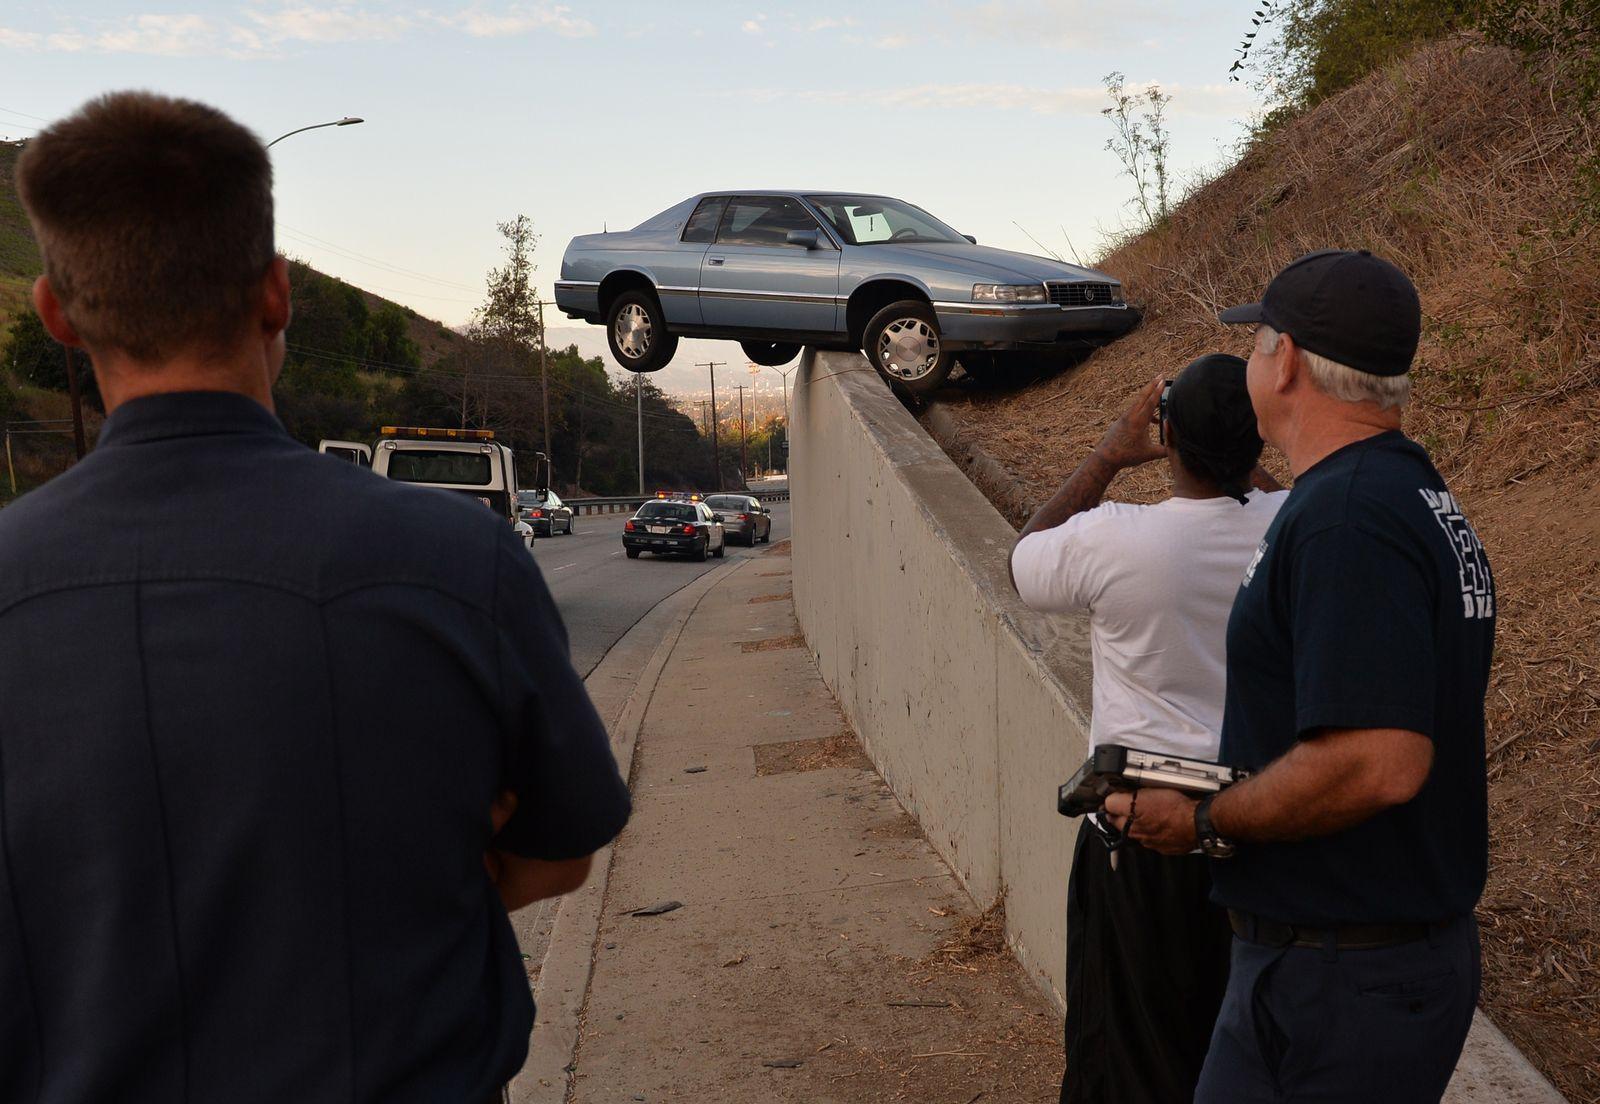 Los Angeles/ Auto auf Mauer